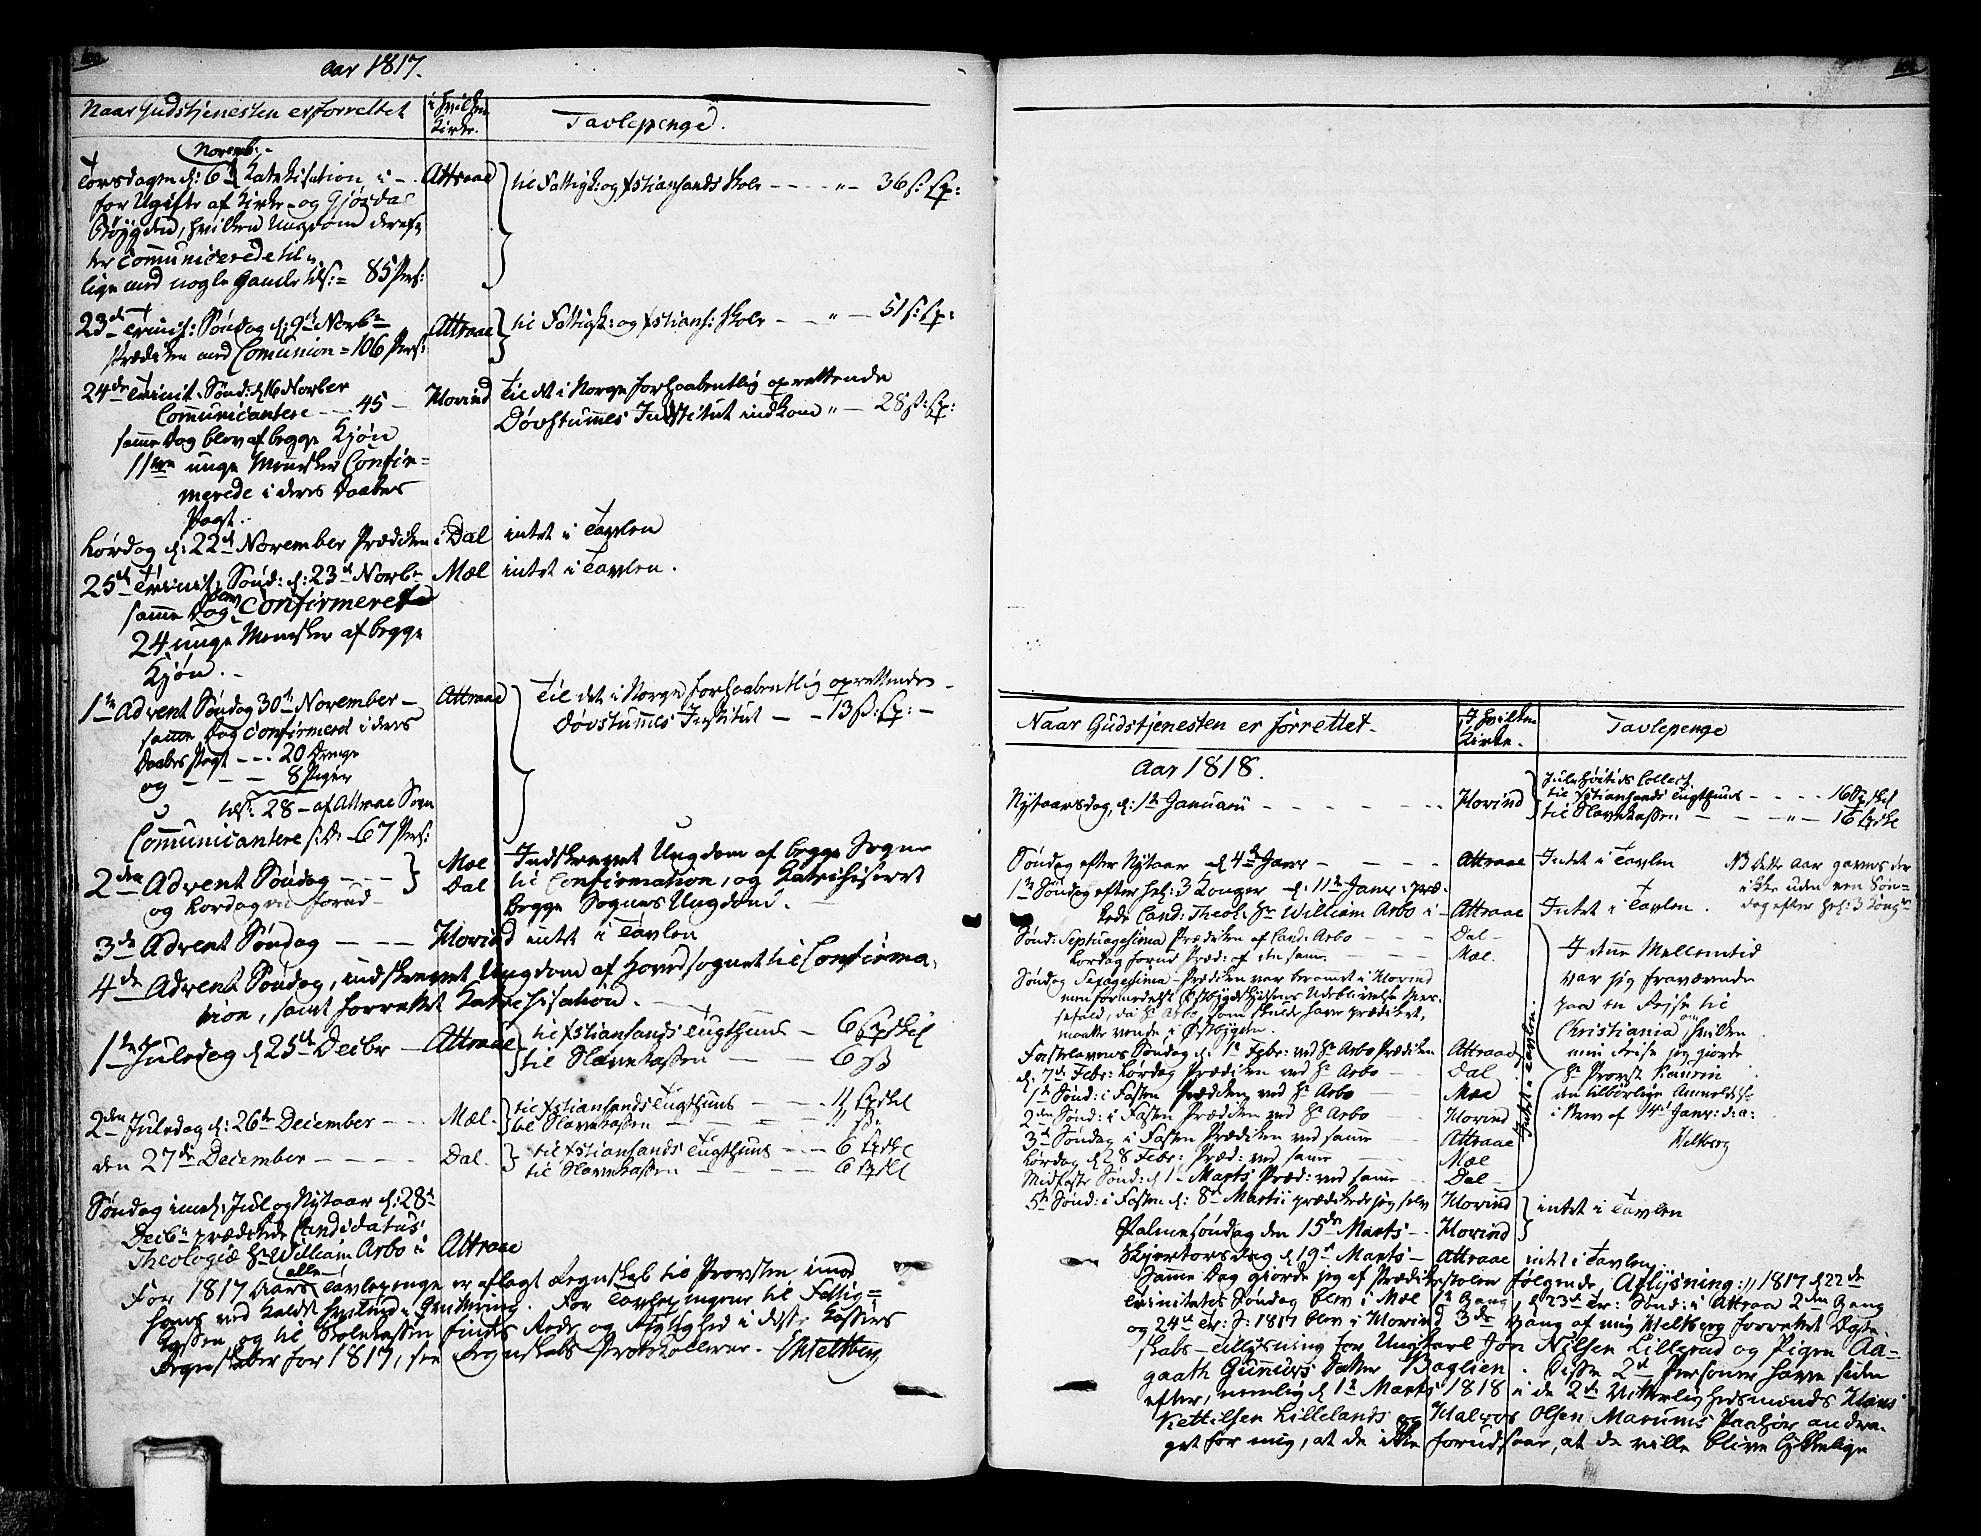 SAKO, Tinn kirkebøker, F/Fa/L0003: Ministerialbok nr. I 3, 1810-1814, s. 100-101